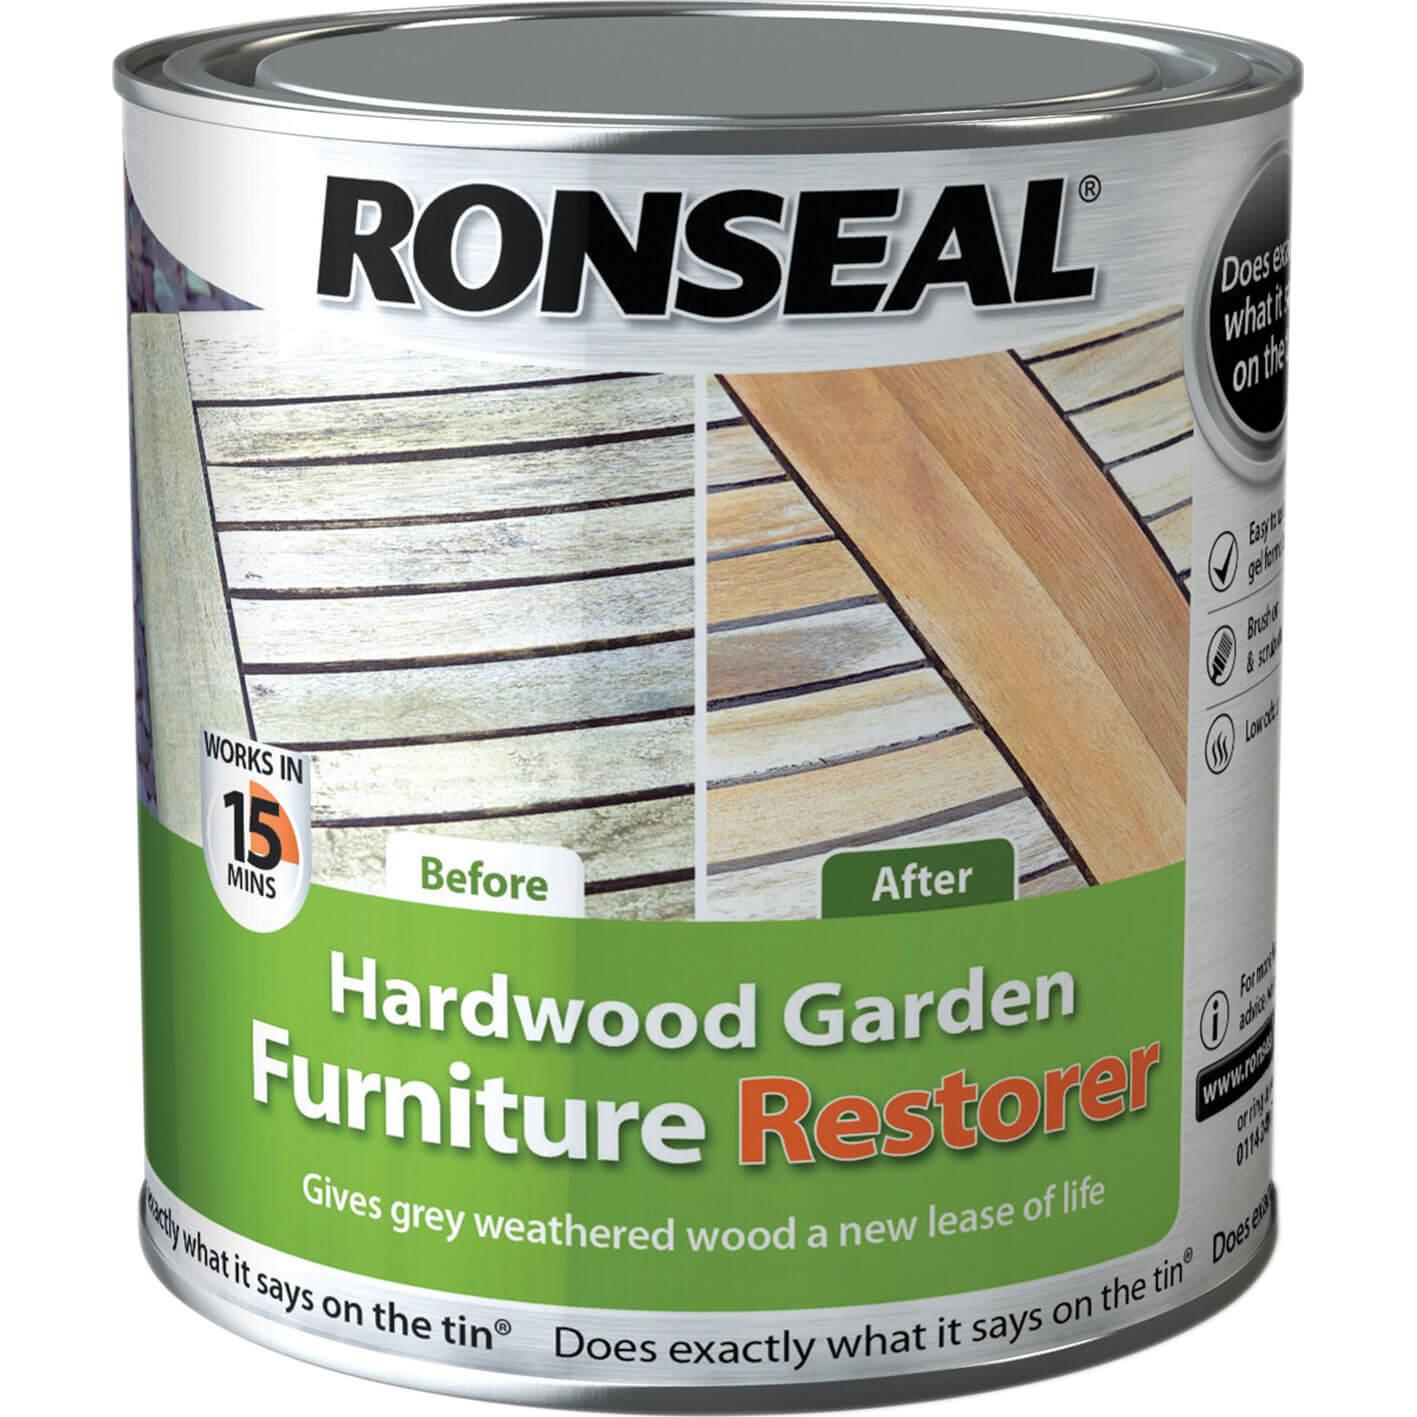 Image of Ronseal Hardwood Garden Furniture Restorer 1l